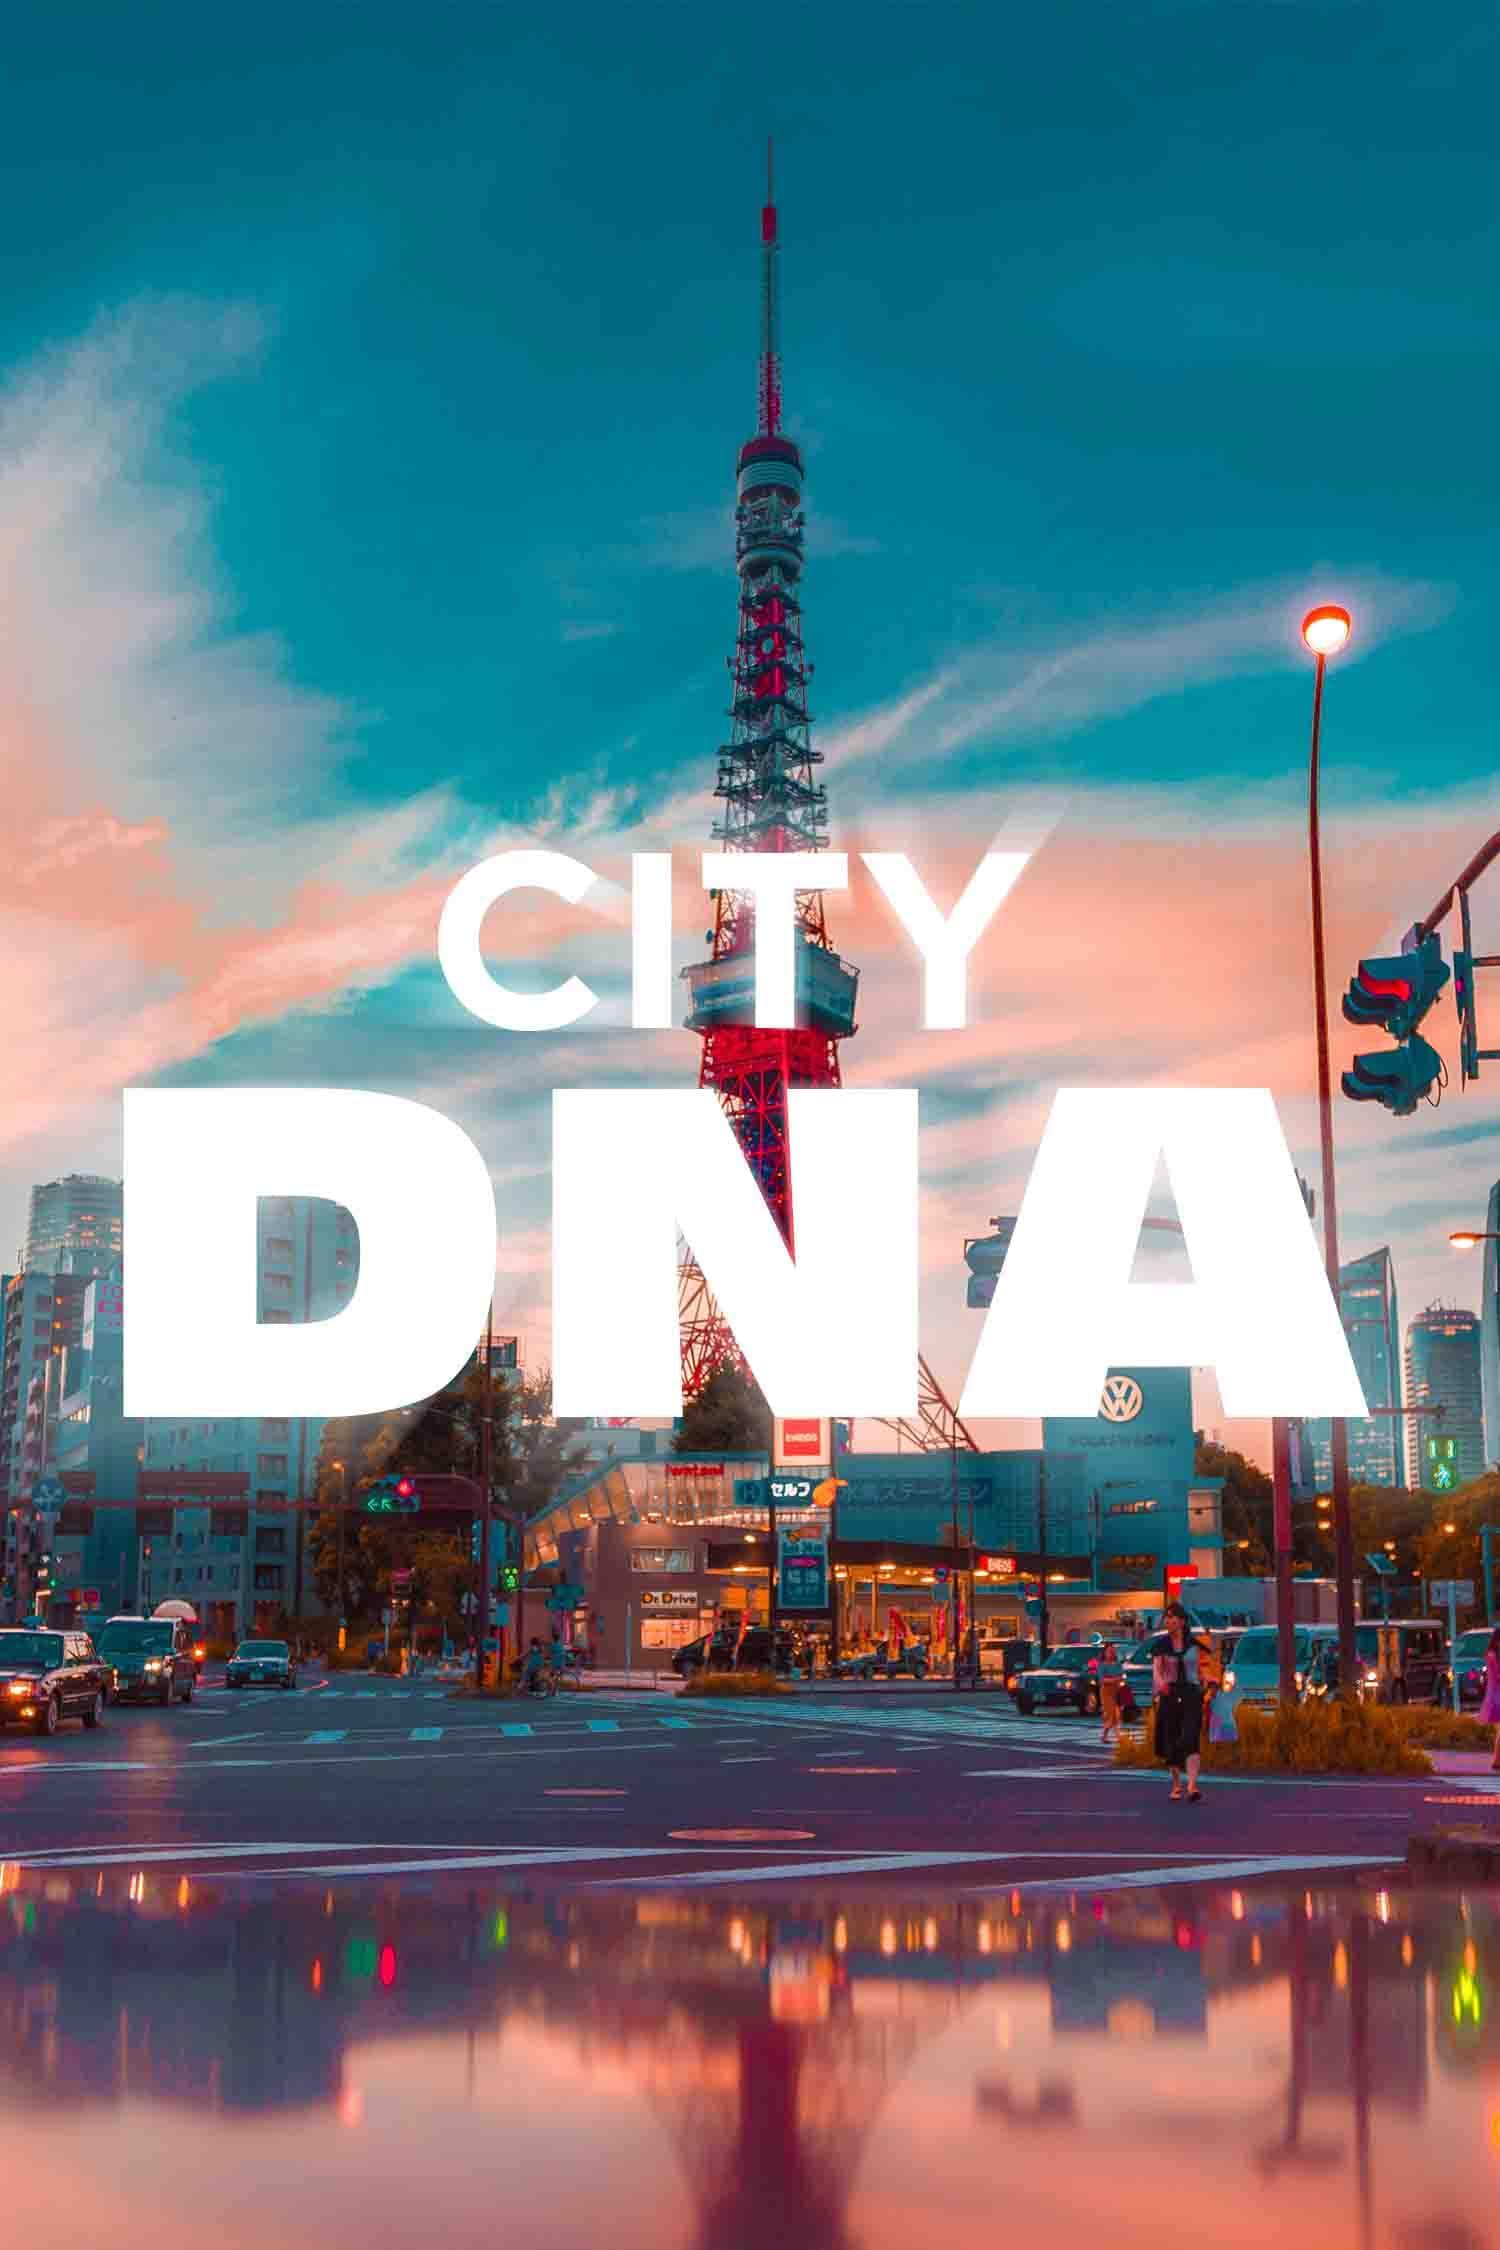 City D.N.A.